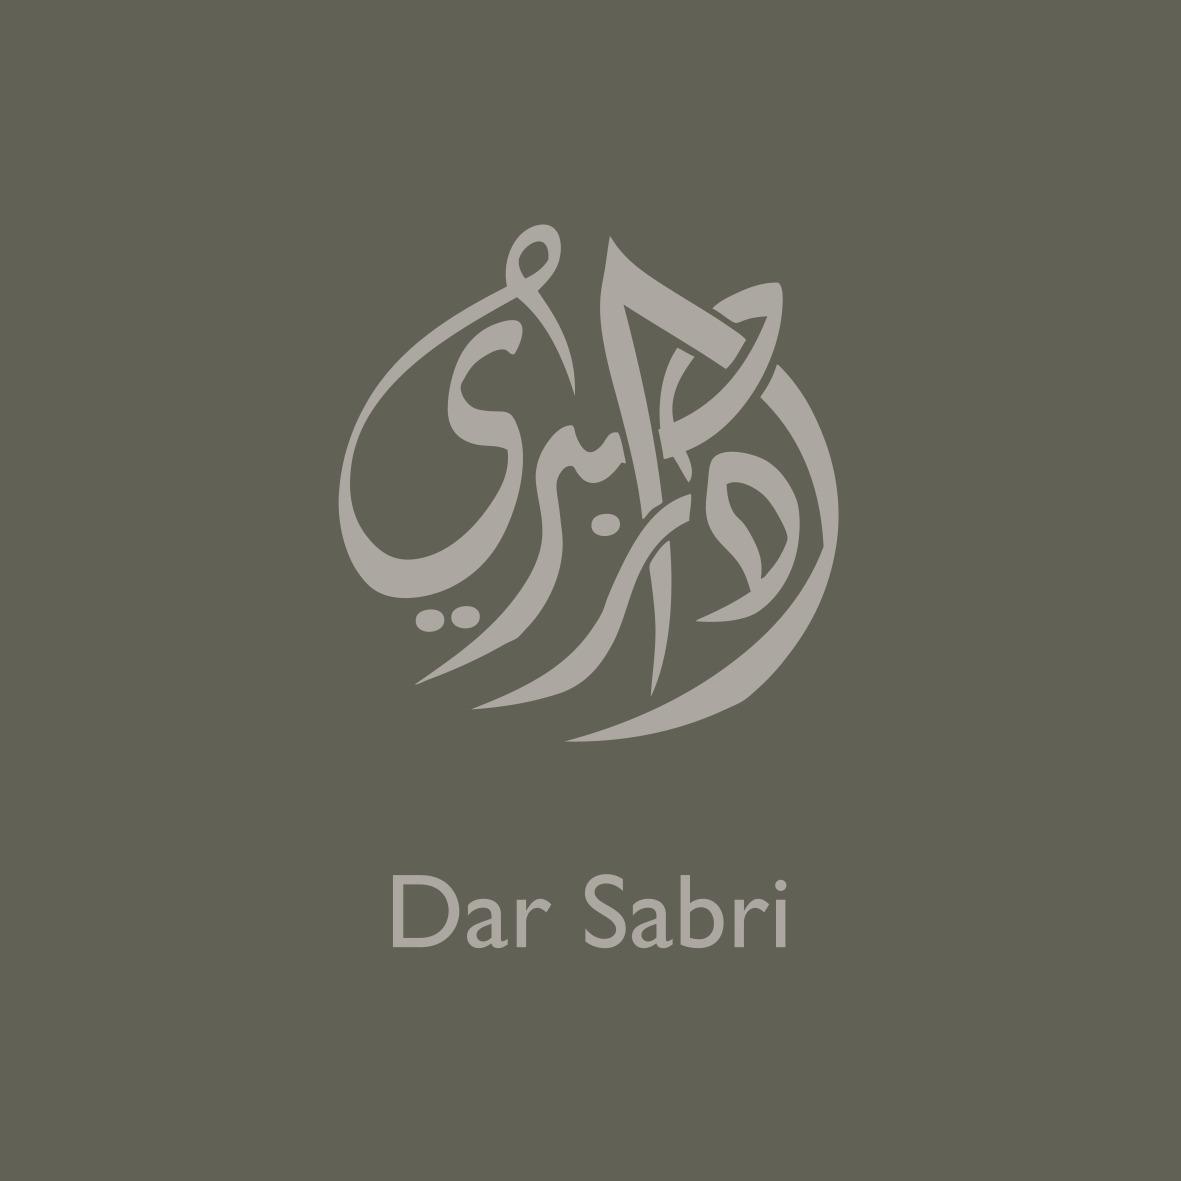 Dar Sabri